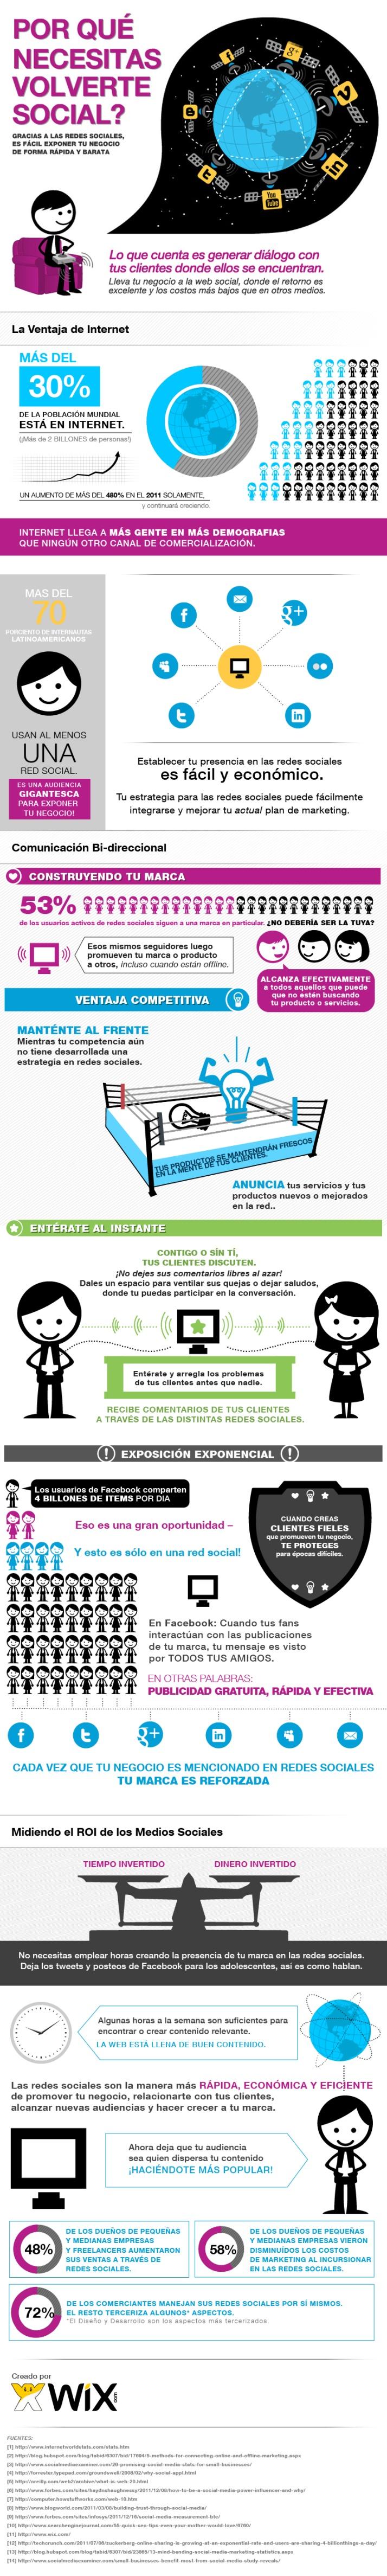 Estrategia online redes sociales